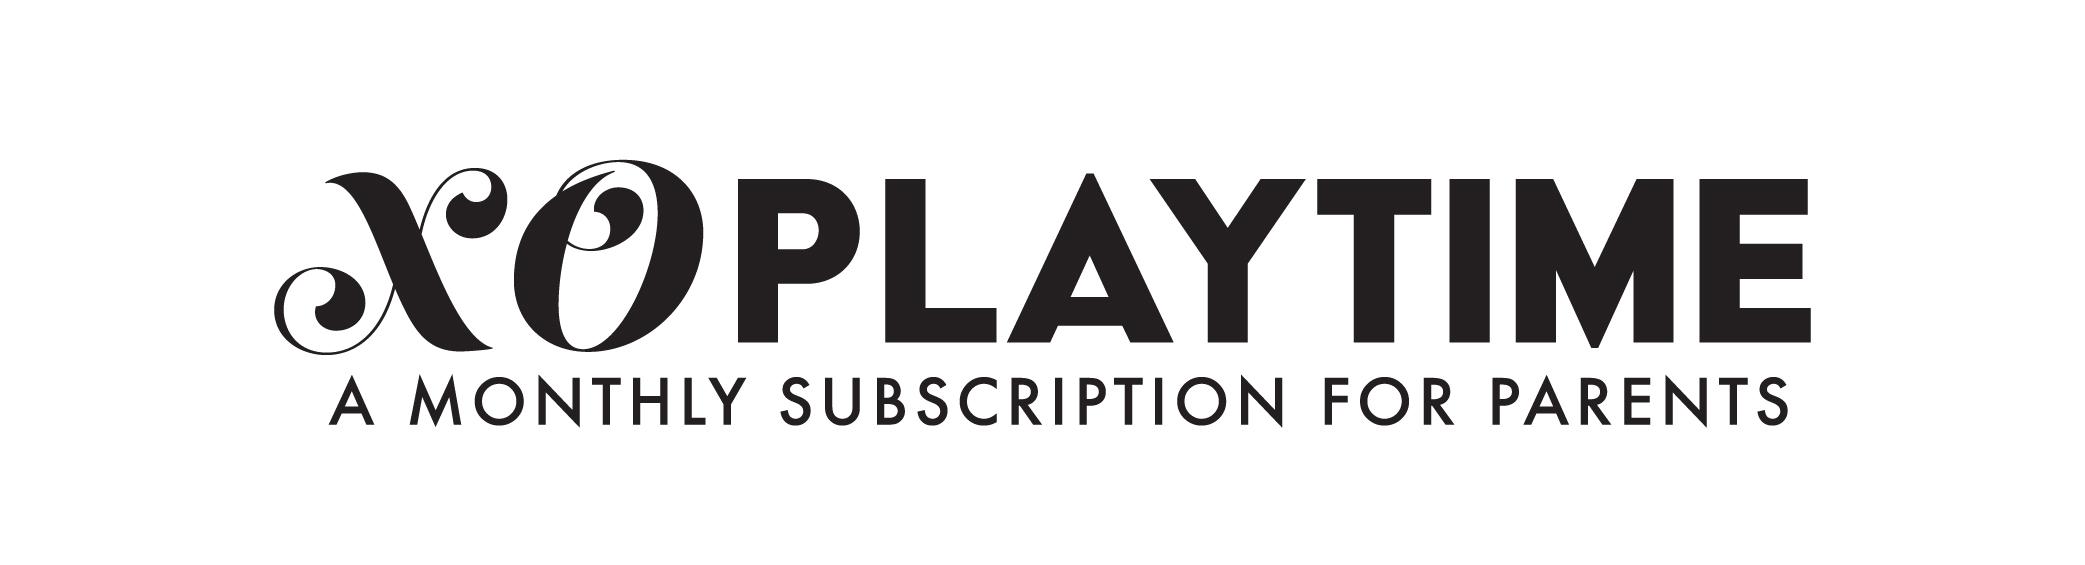 subscription-11.jpg